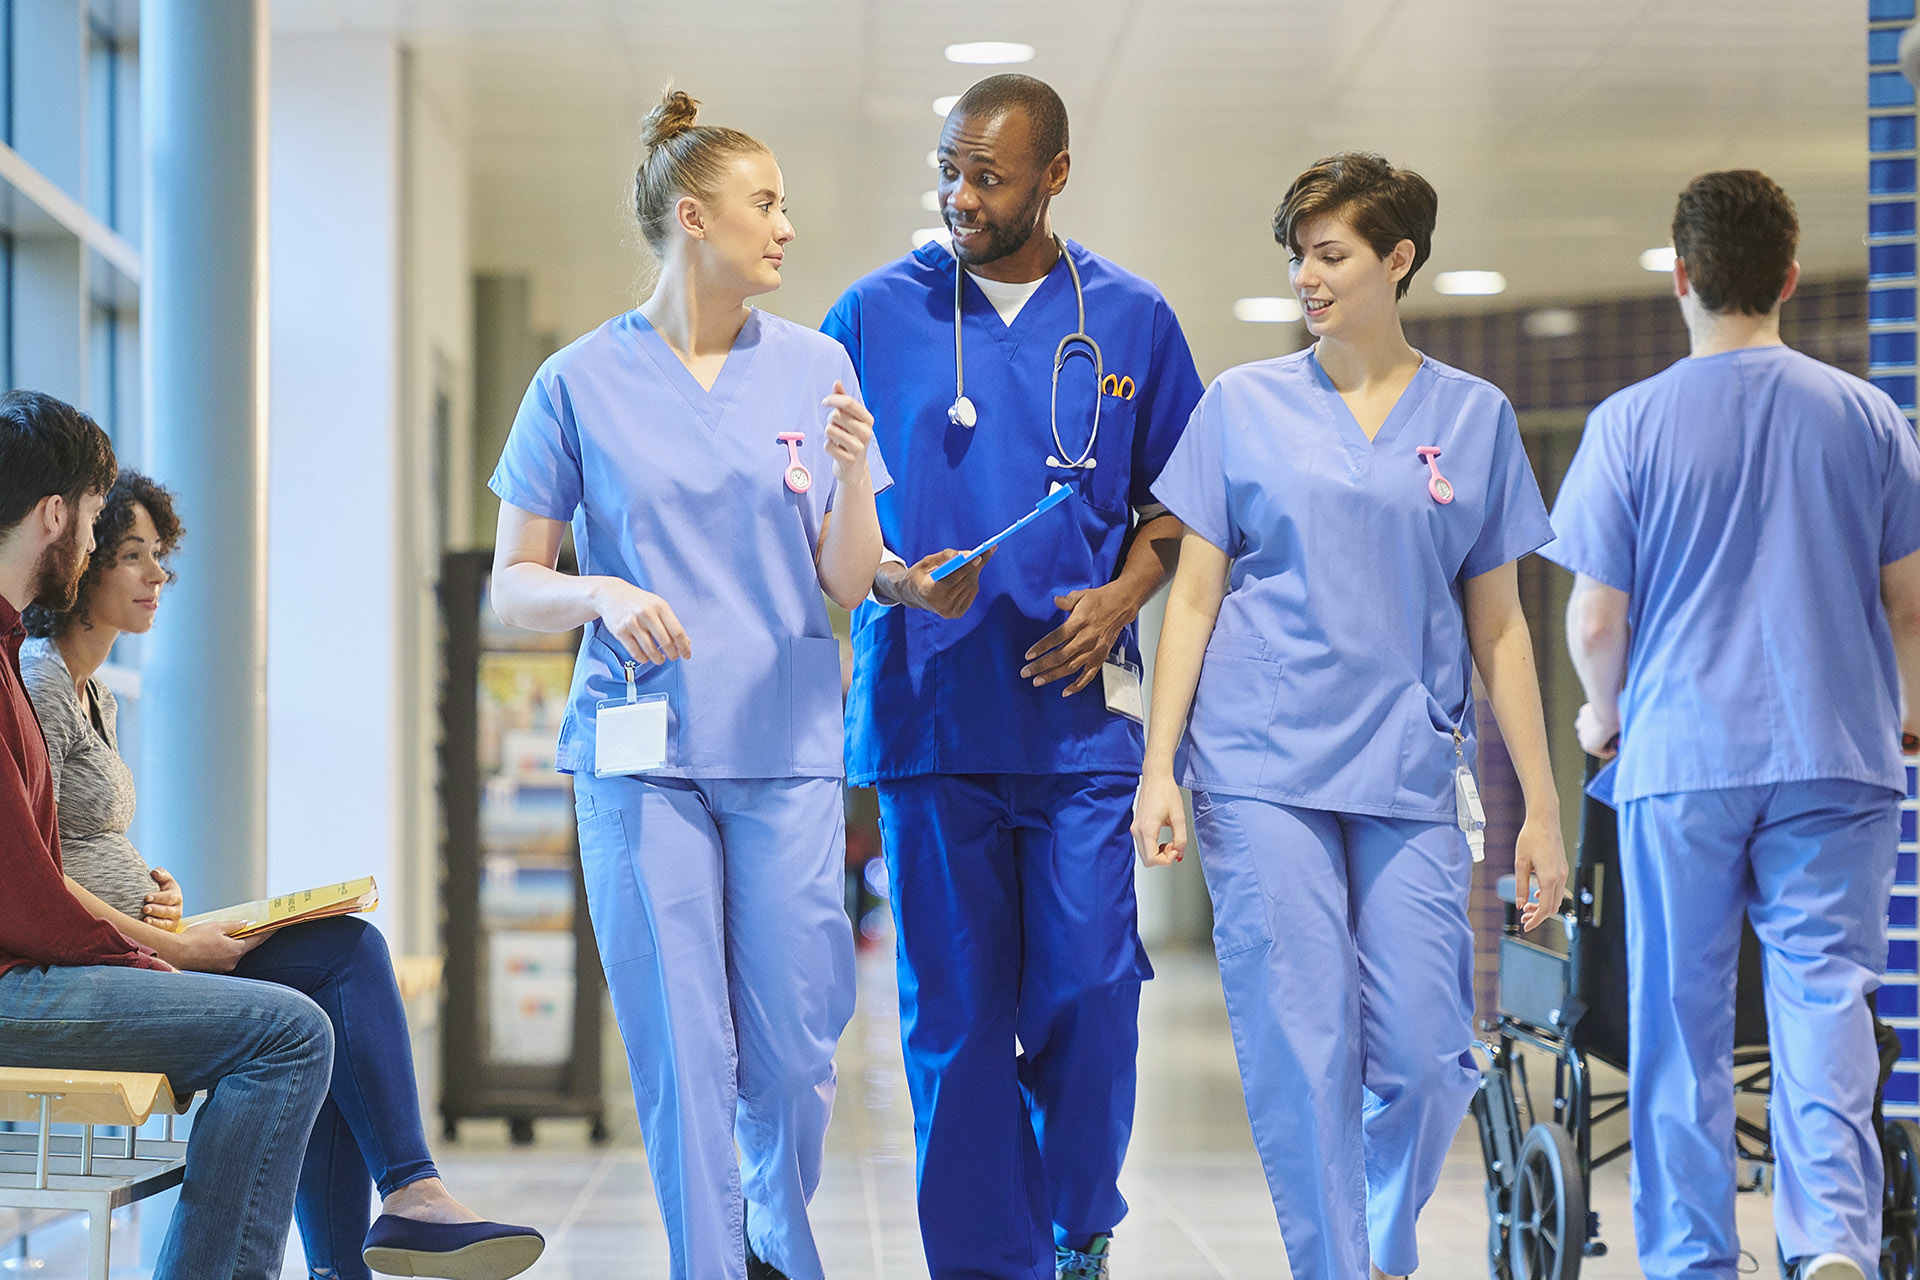 Health staff walk along a hospital corridor